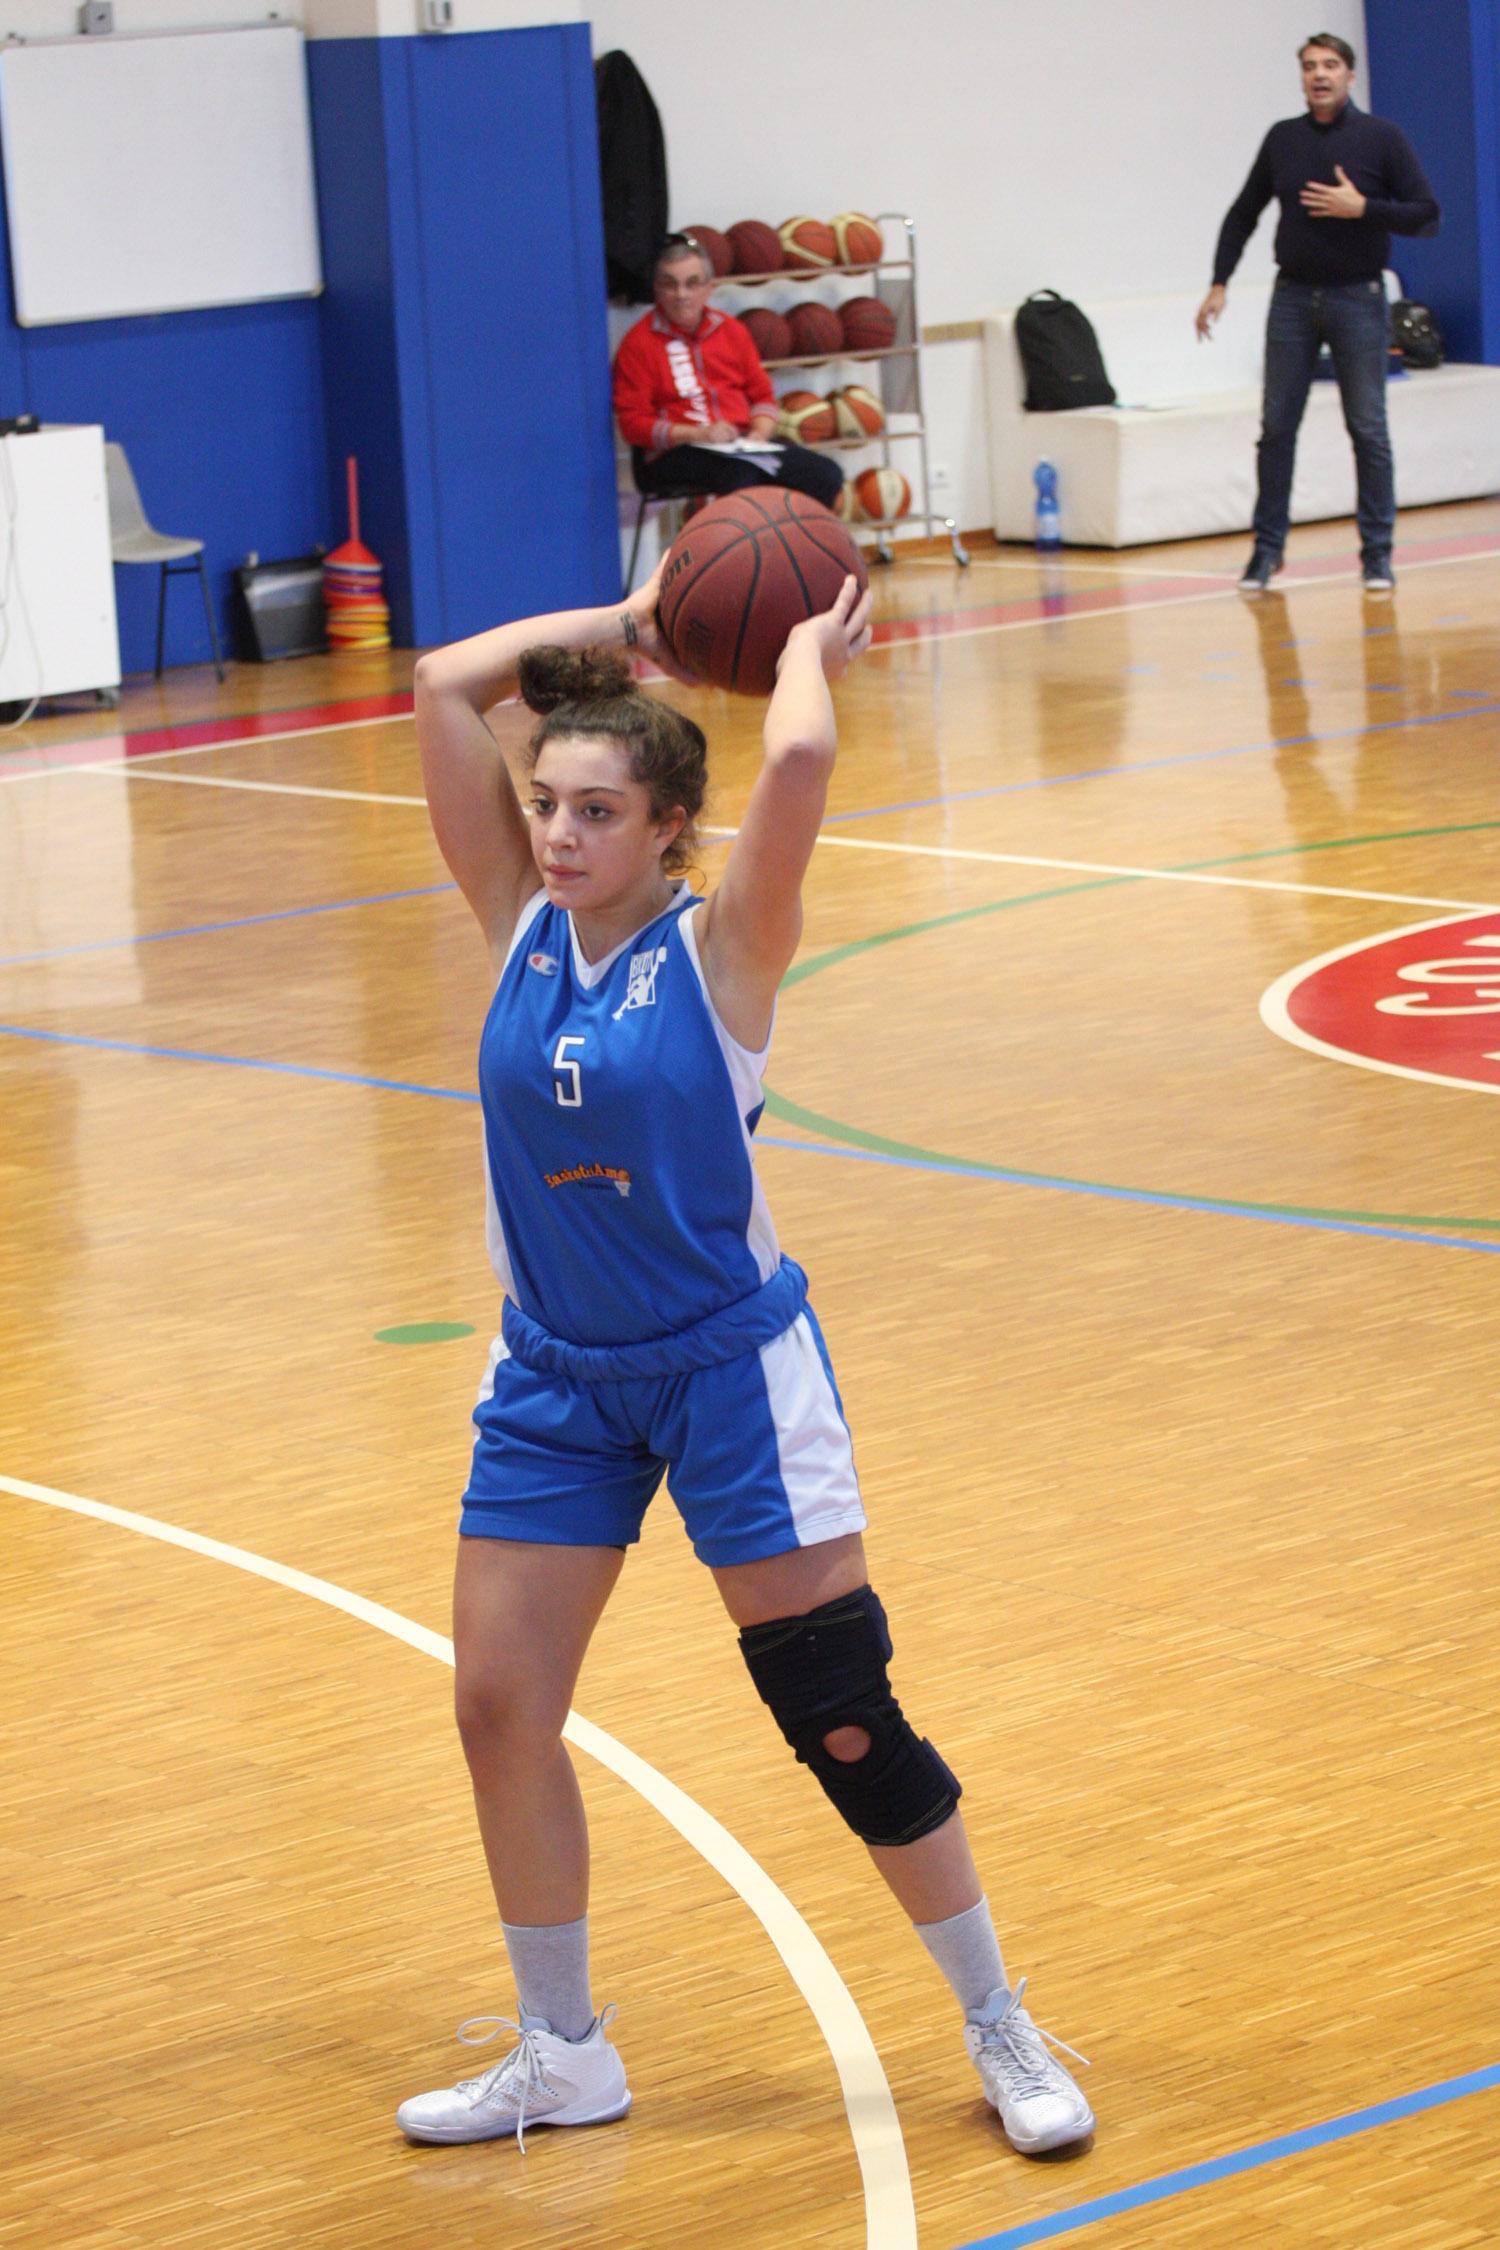 U16E - Costa Masnaga vs Baskettiamo Vittuone 2001 00013.jpg